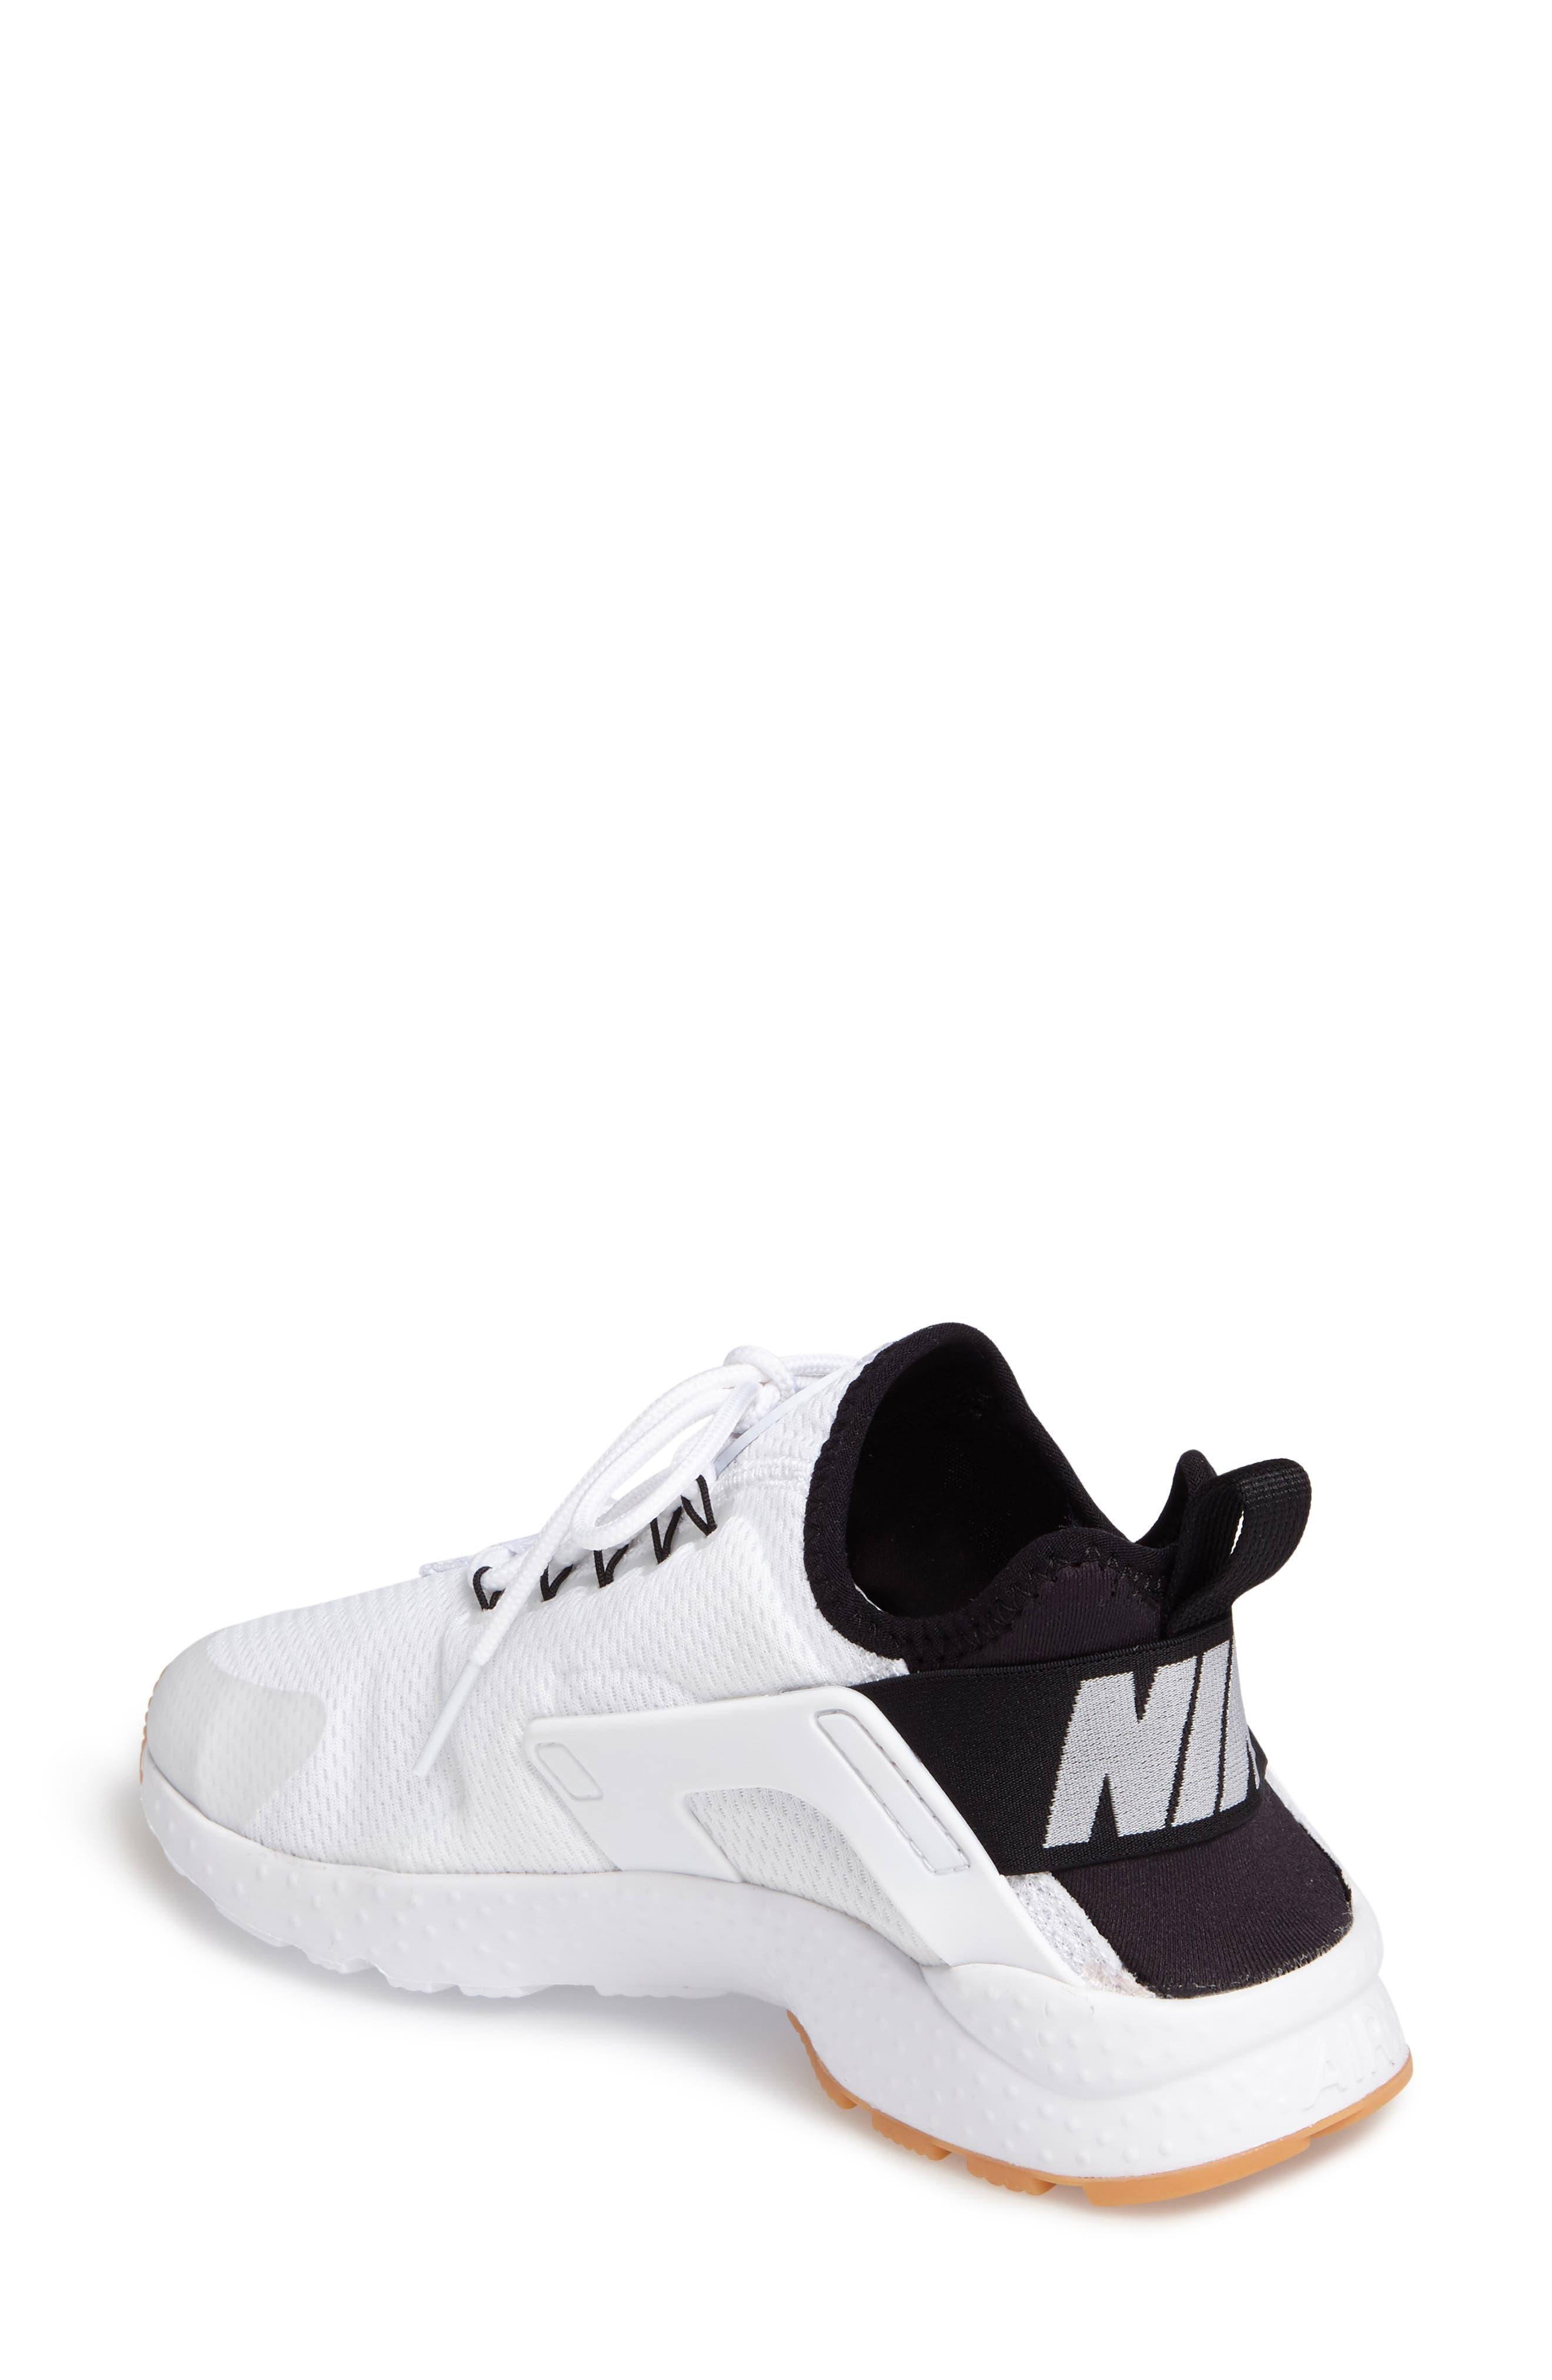 Air Huarache Sneaker,                             Alternate thumbnail 59, color,